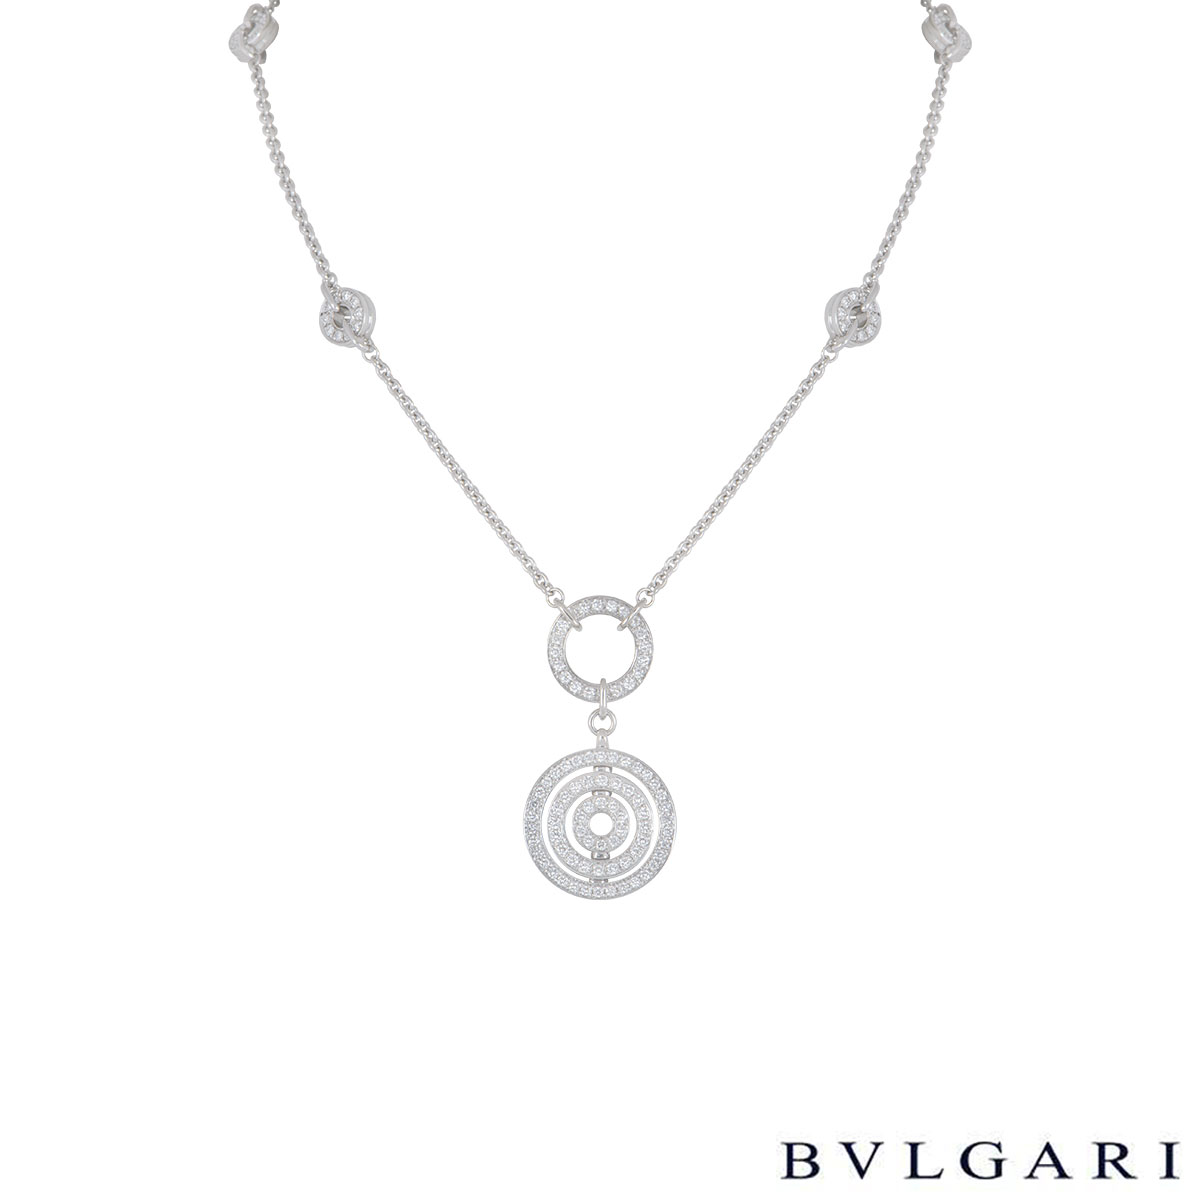 Bvlgari White Gold Diamond Astrale Necklace